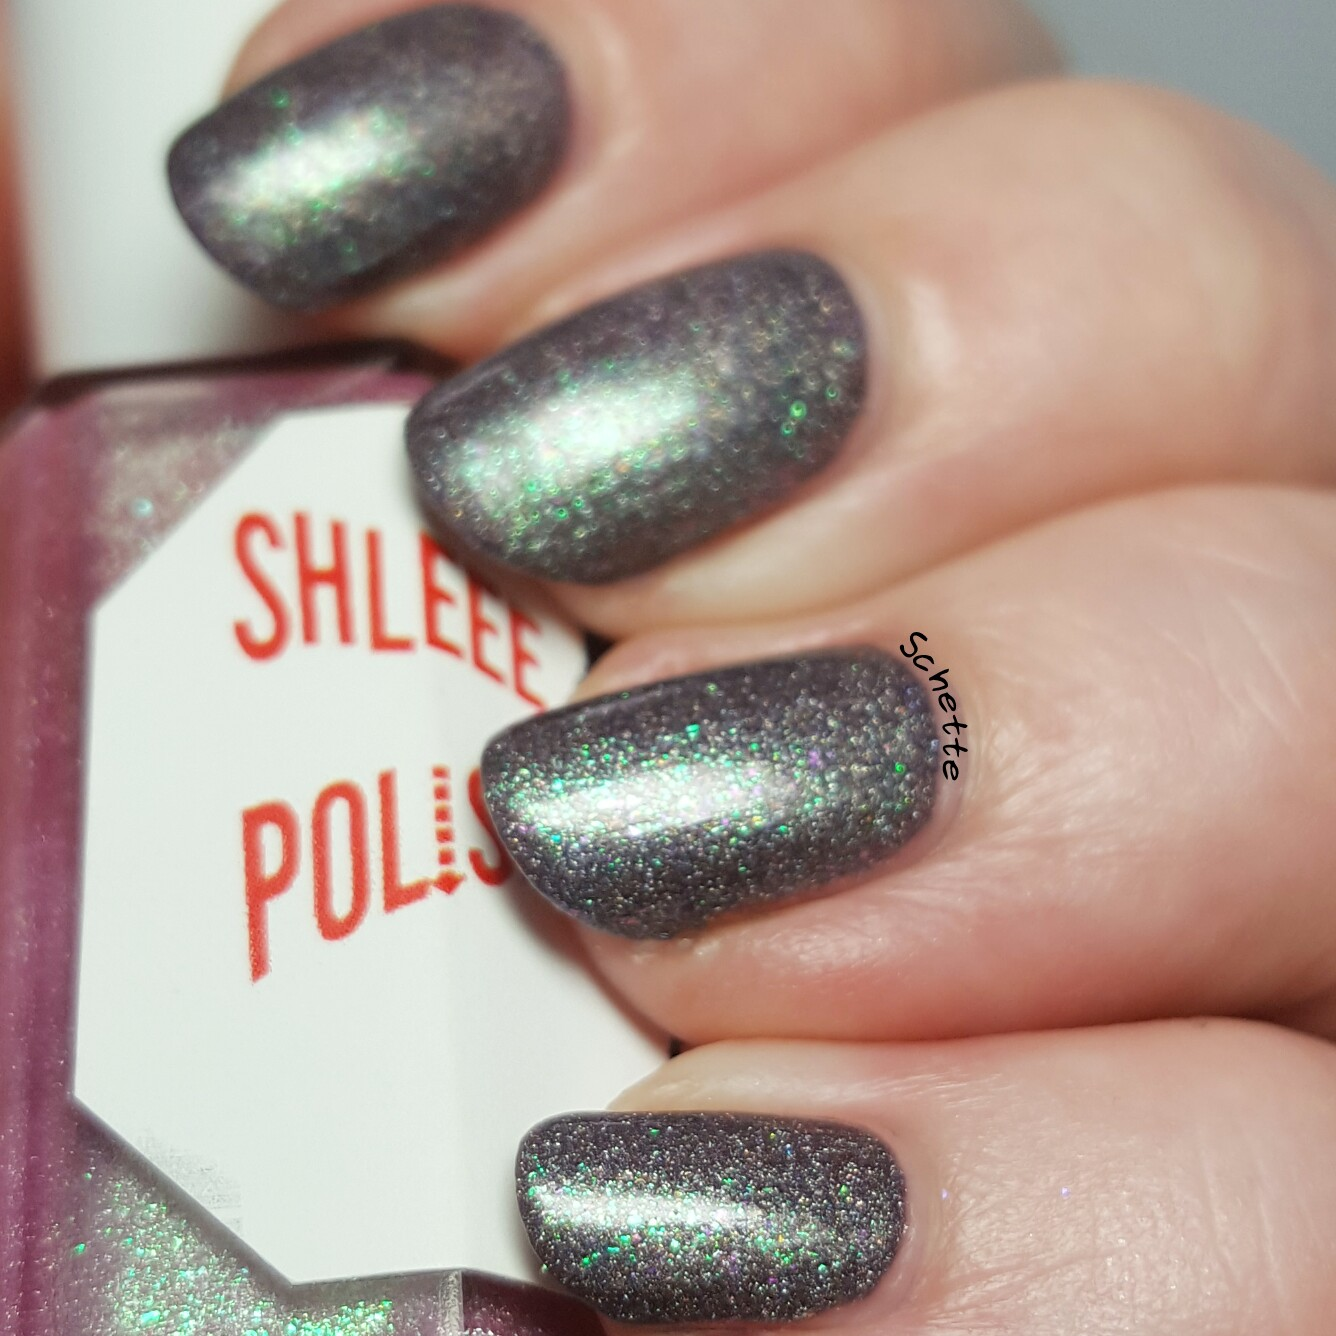 Shleee Polish - Sample 5